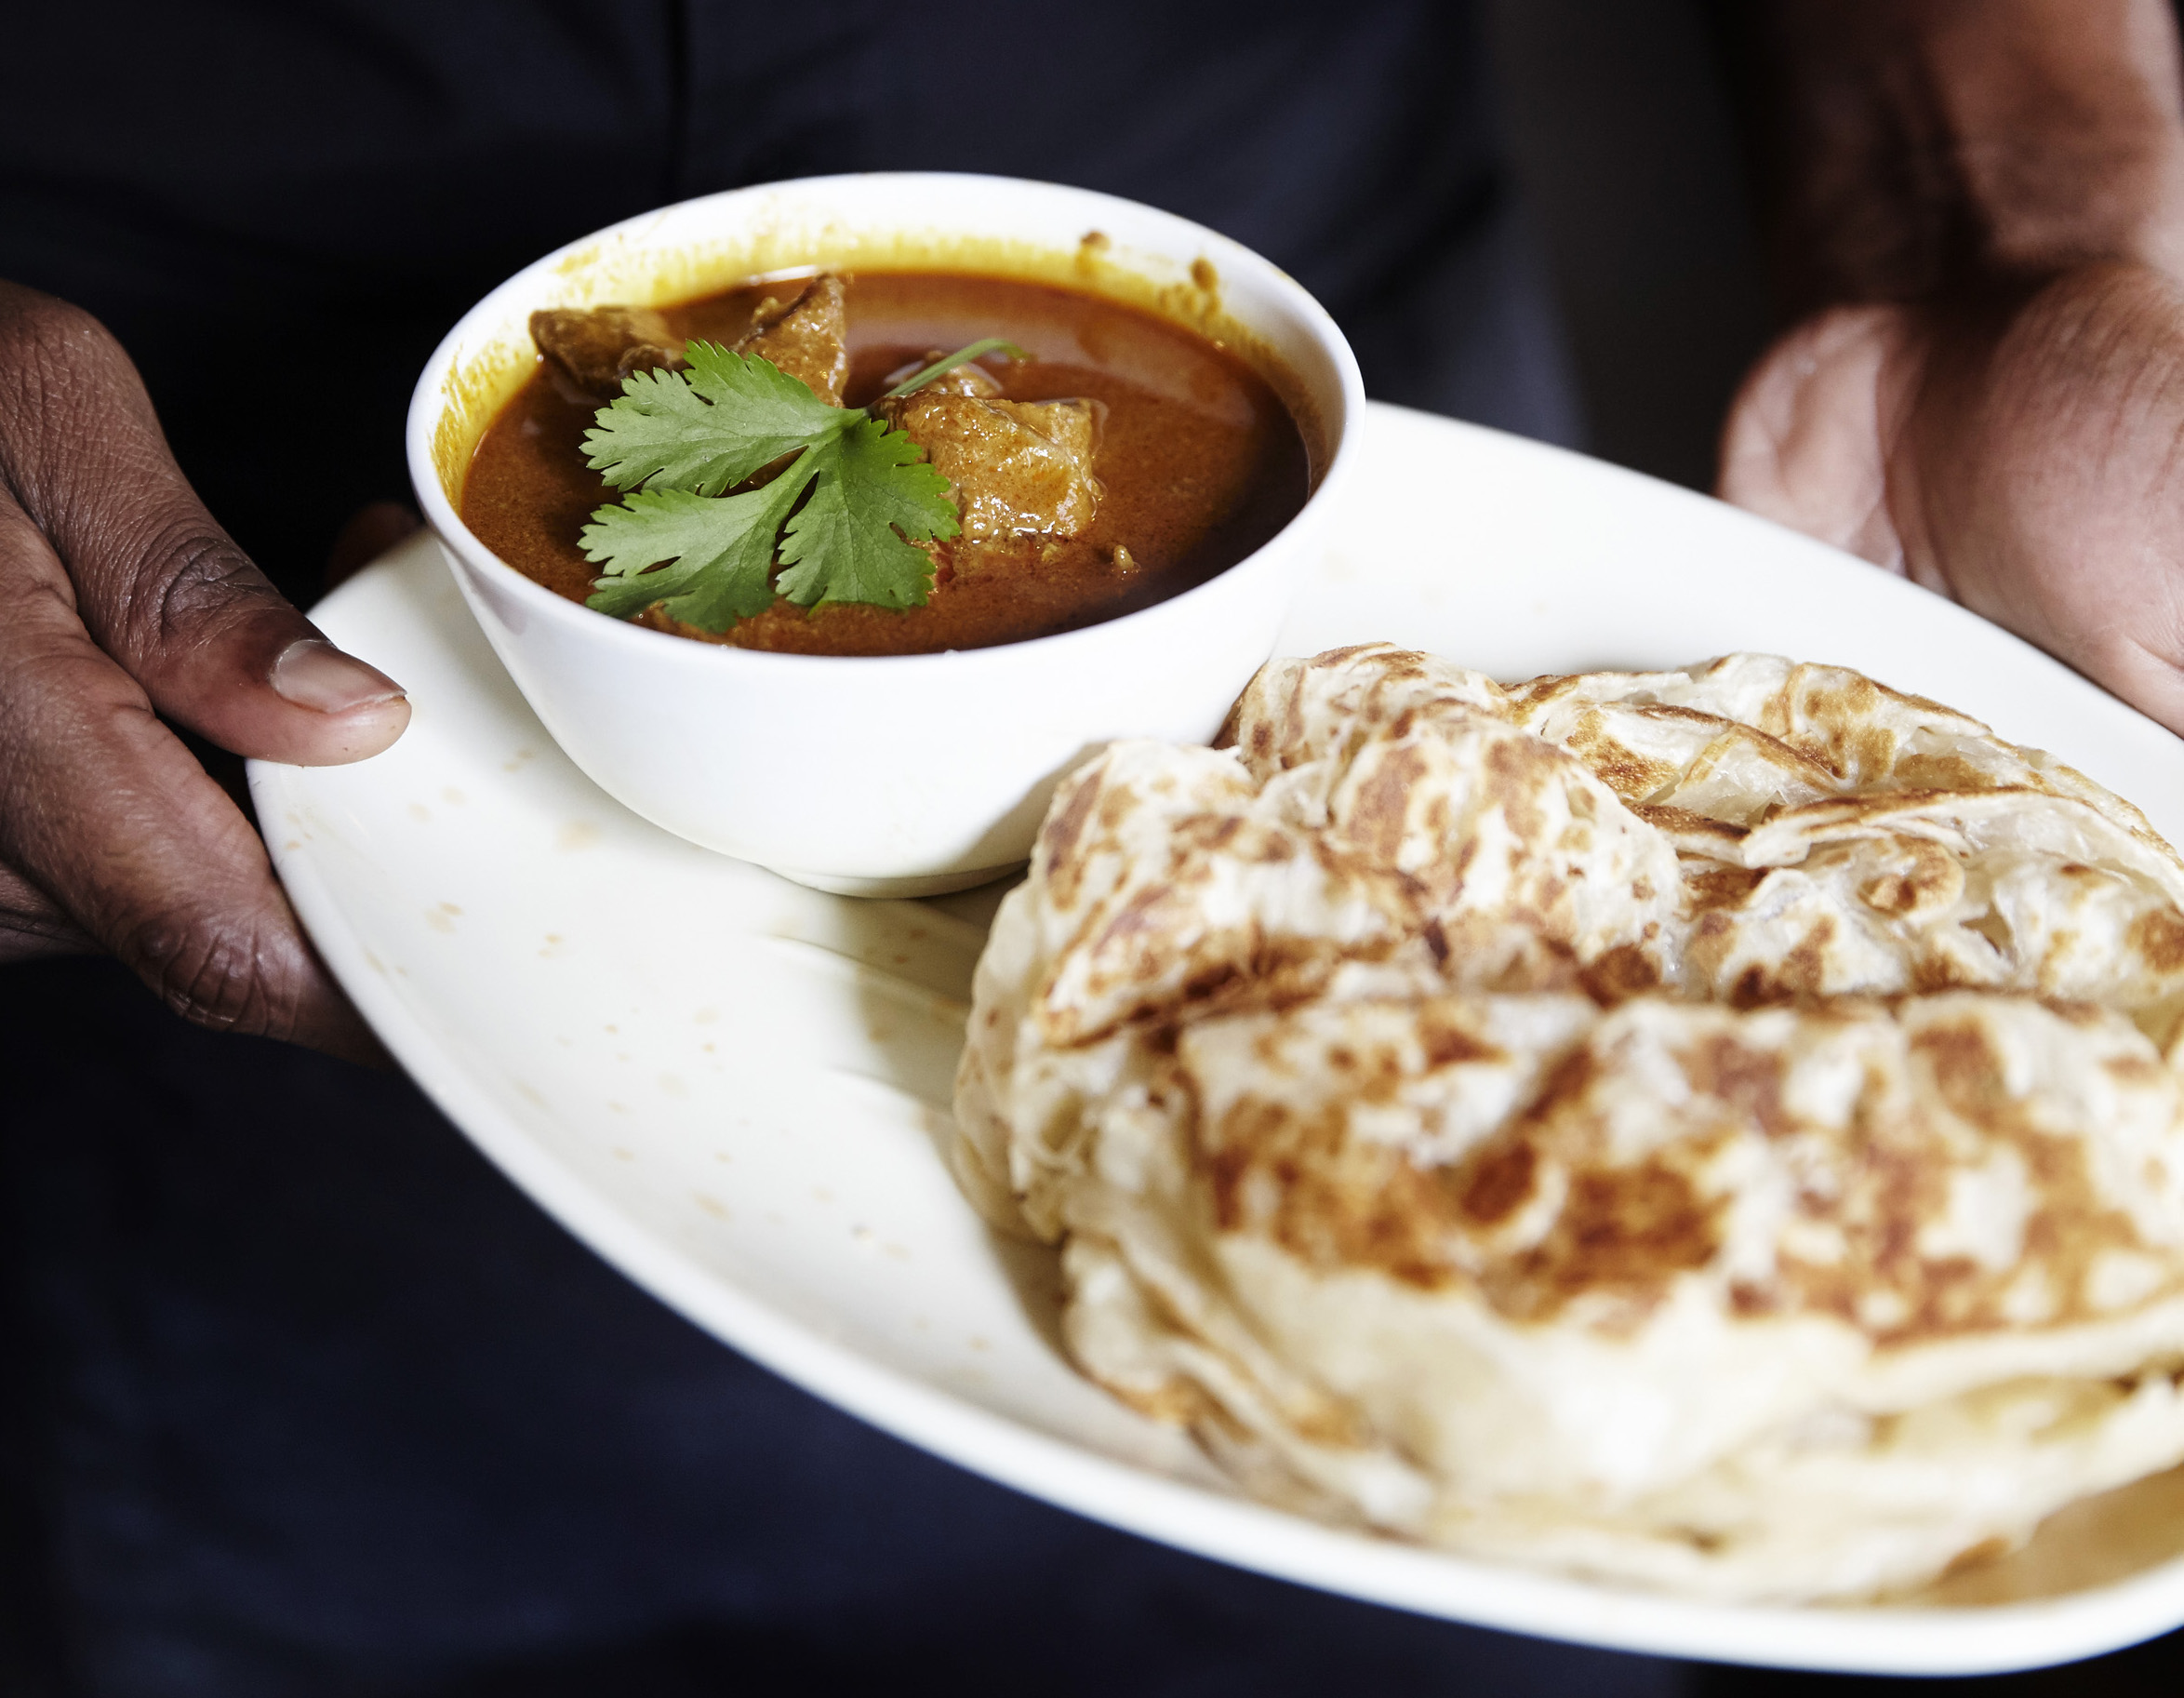 Roti canai at Roti King, reopened in Euston